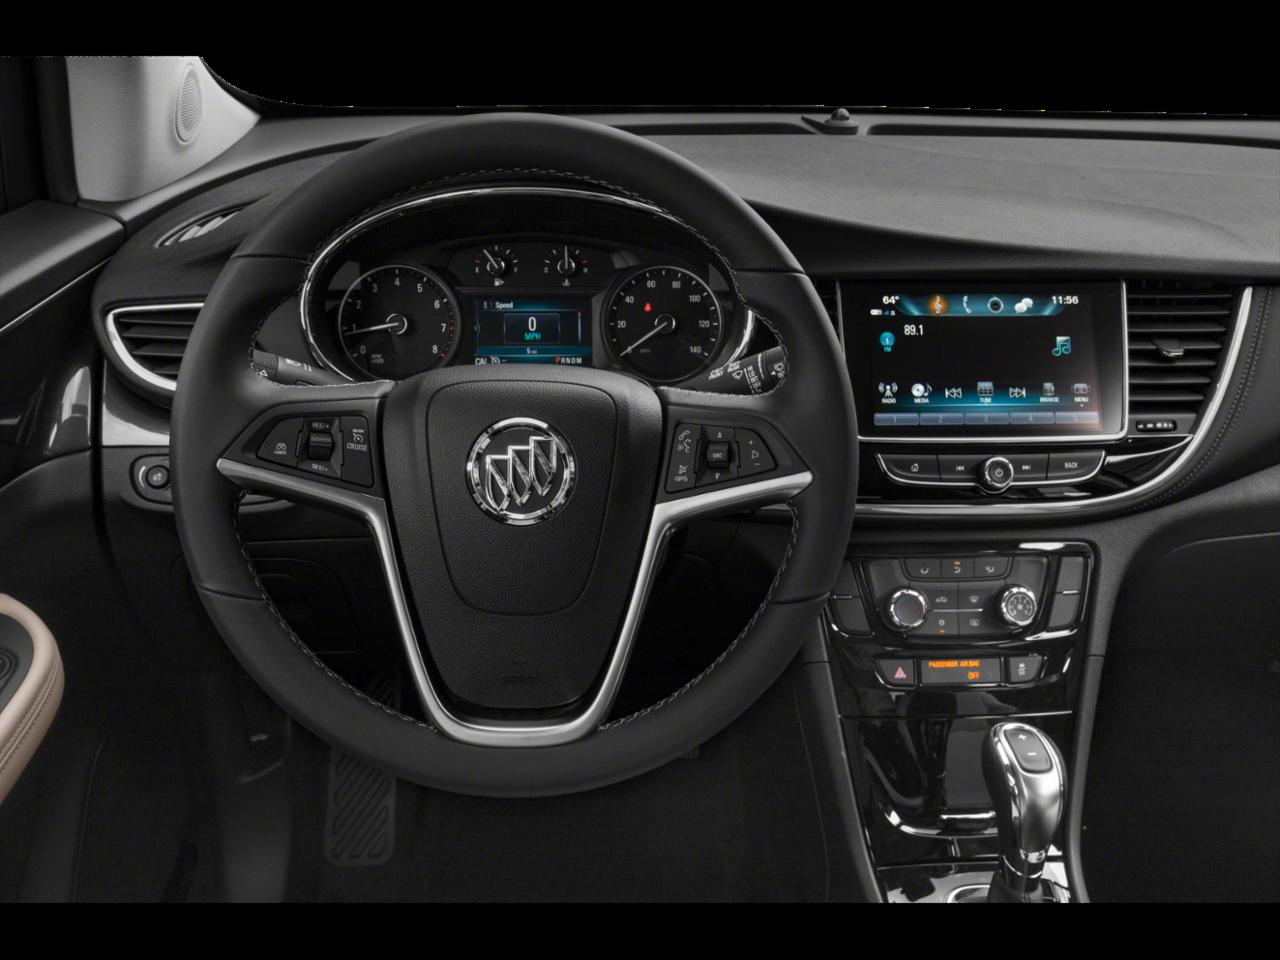 image-6 2020 Buick Encore